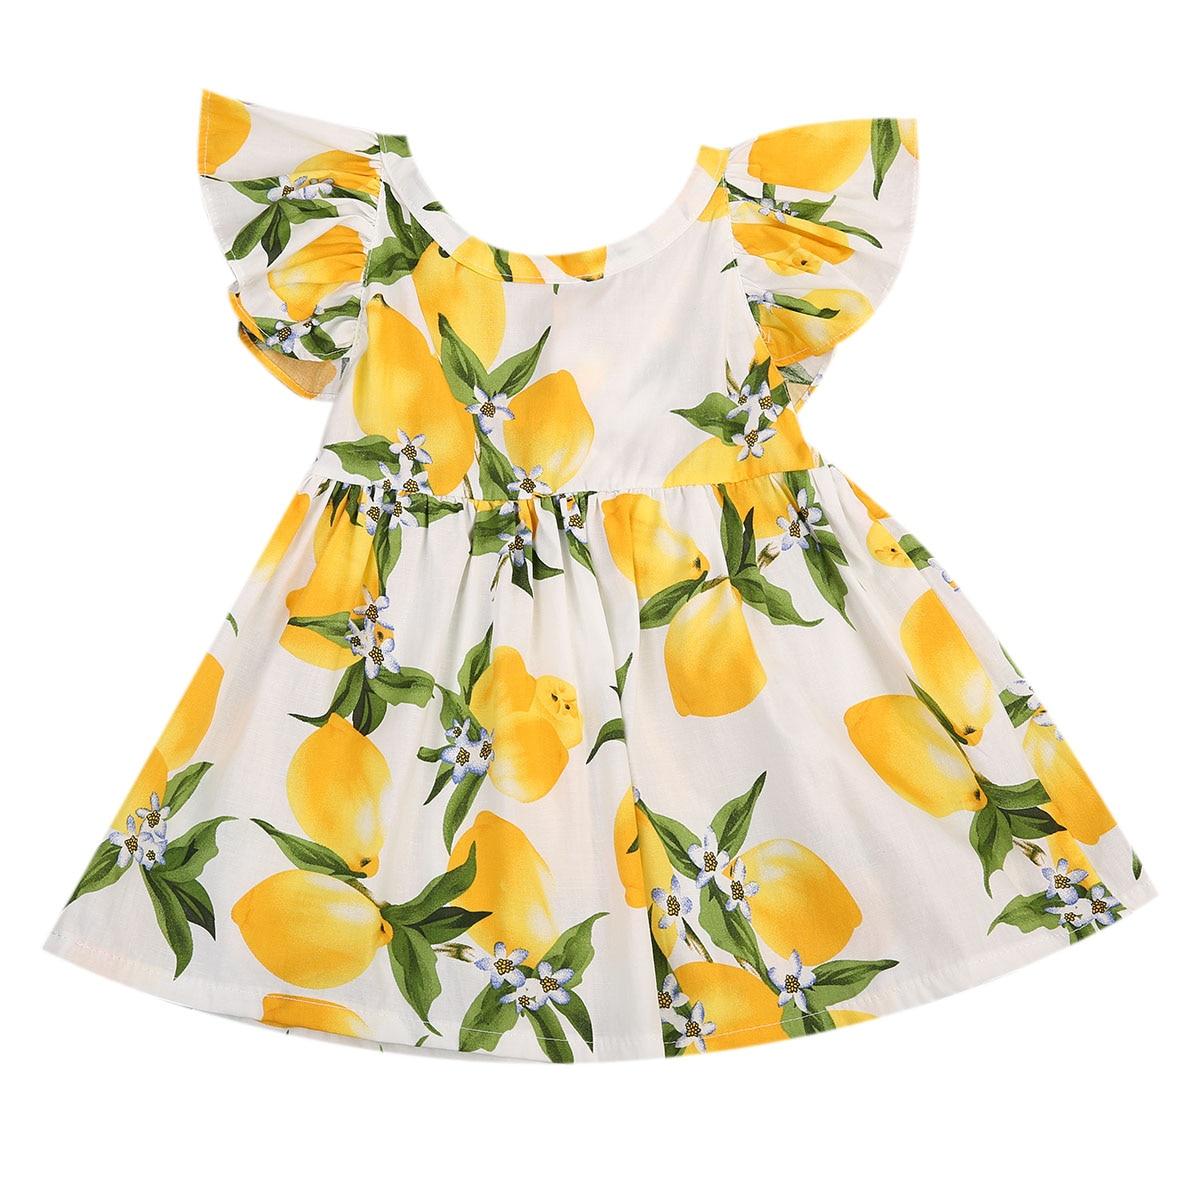 Pudcoco brand Kids Dress 2017 Summer Fly Sleeve Sundress Lemon Print font b Baby b font